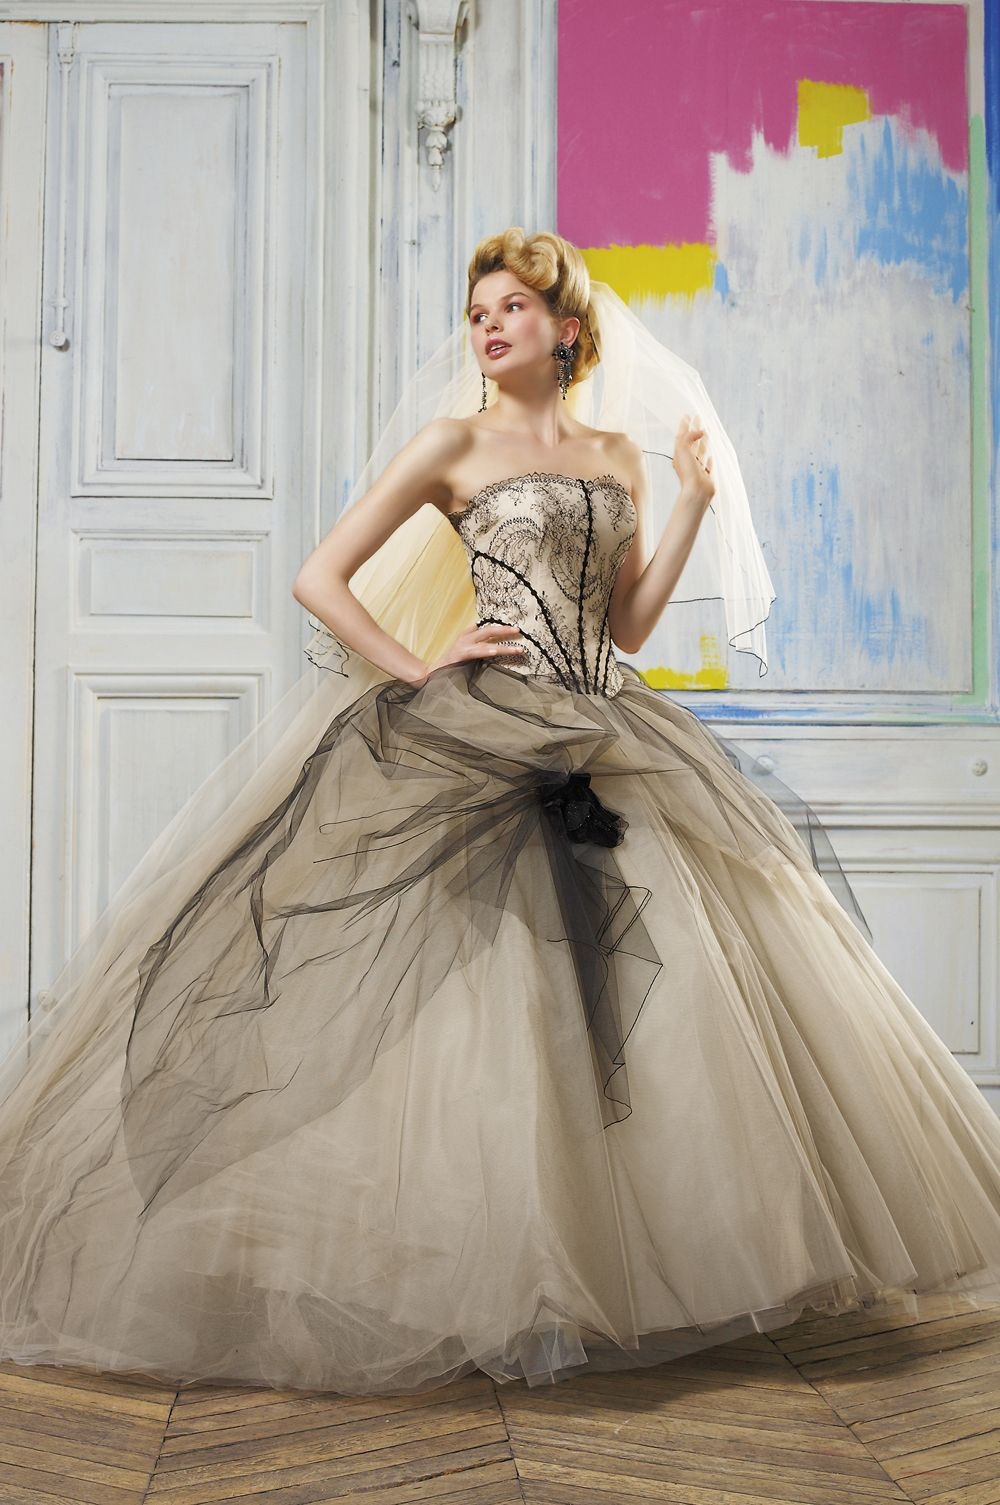 Champagne colored wedding dress  Love this  My wedding  Pinterest  Weddings